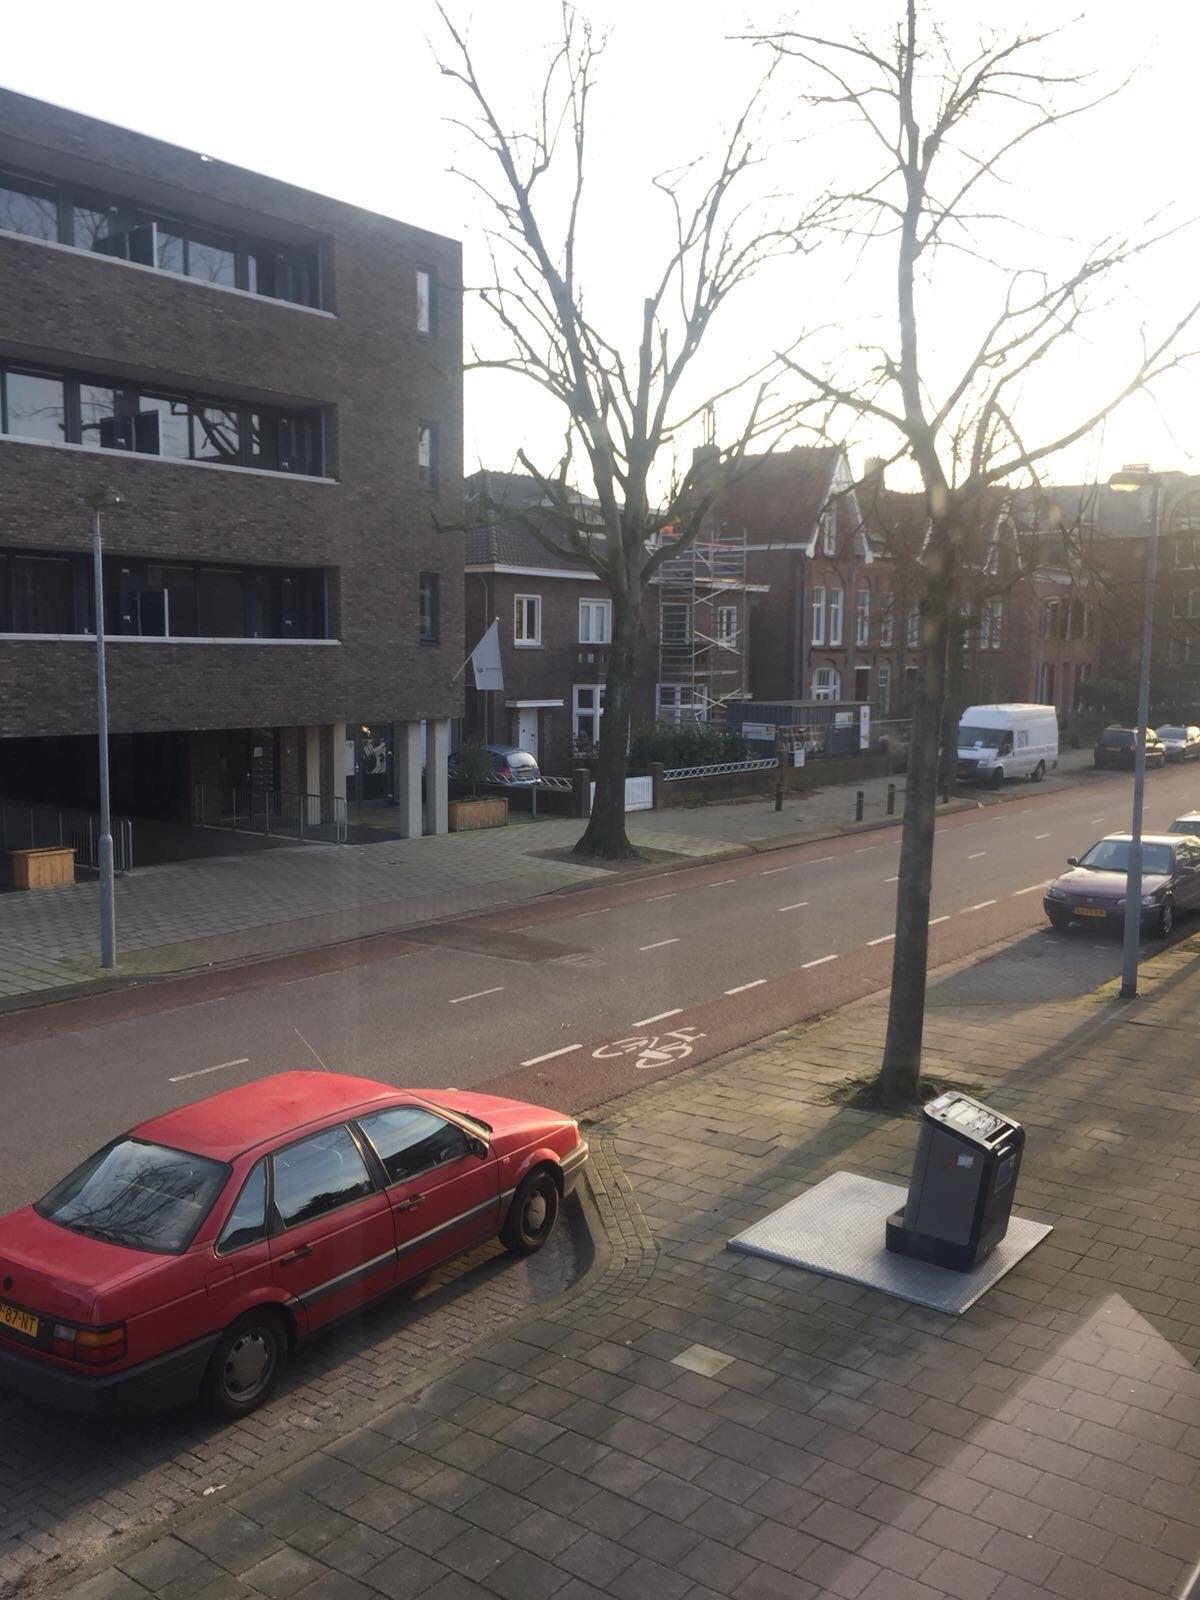 https://public.parariusoffice.nl/298/photos/huge/51563729.1518087852-244.JPG